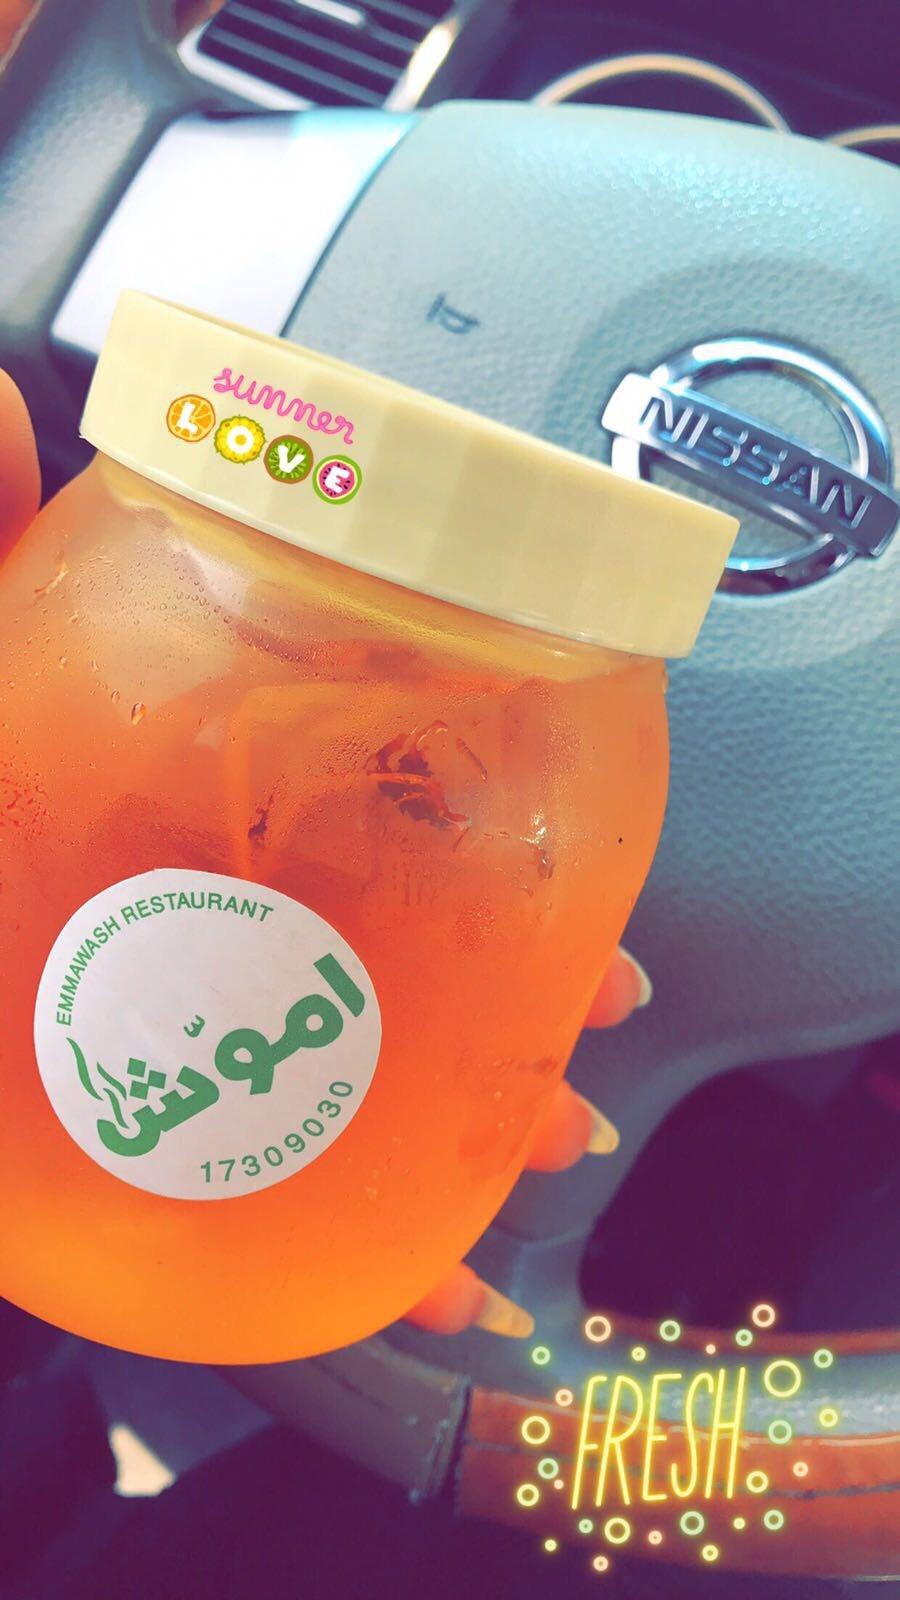 احلى عصير زعفران، جربوه حده لذيذ و بارد😍 @ Emmawash Traditional - Bahrain